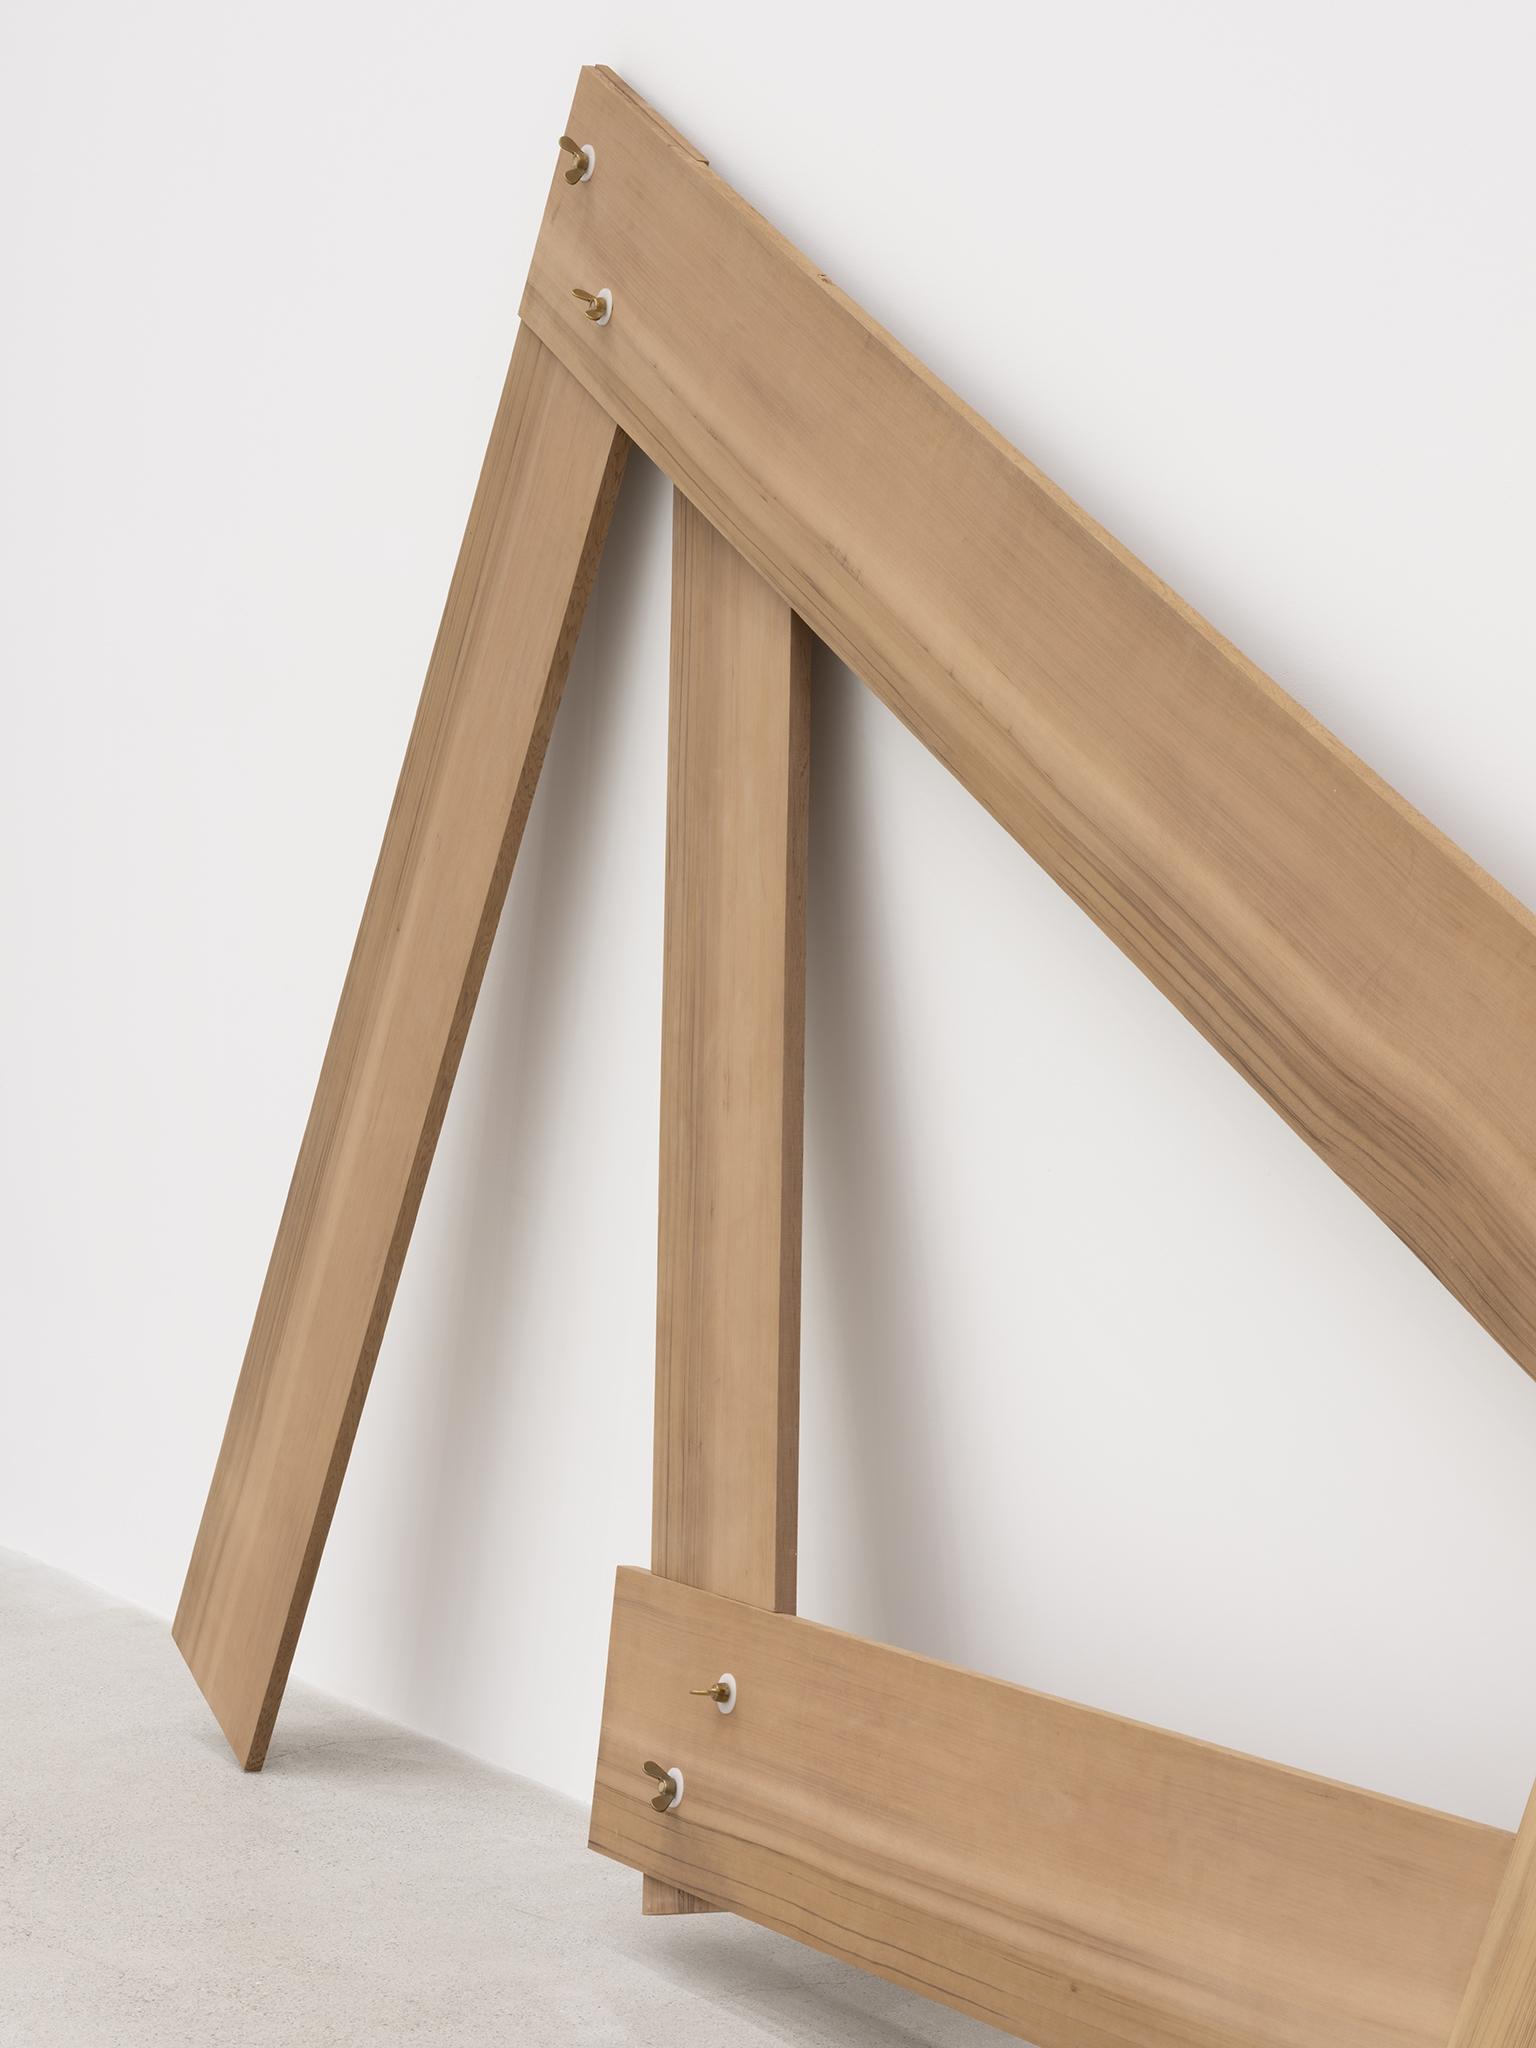 Christina Mackie, Lots/lost (detail), 2012, cedar, brass, nylon, 94 x 388 x 19 in. (238 x 986 x 48 cm) by